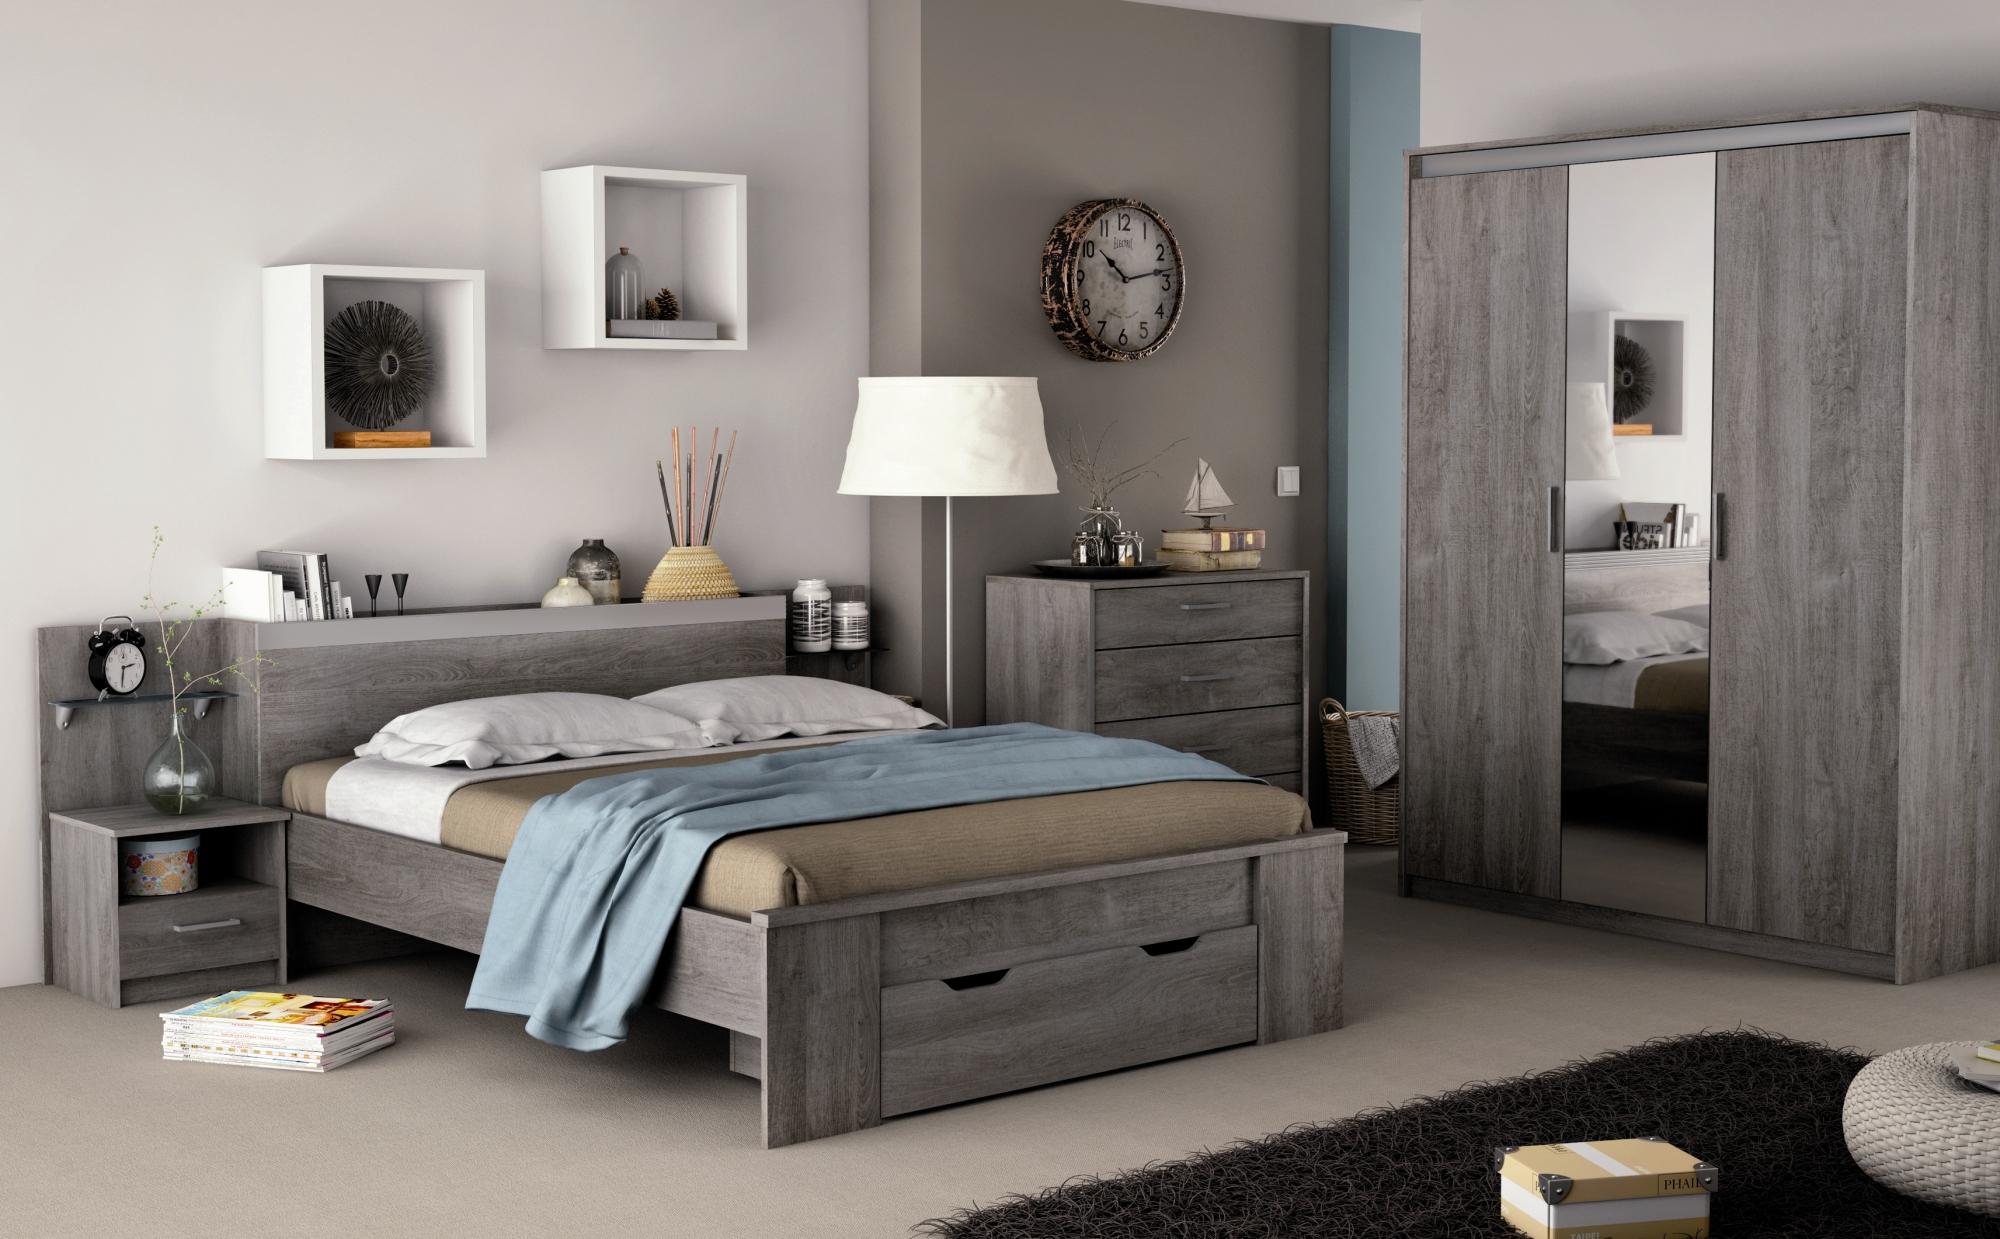 commode adulte contemporaine 4 tiroirs ch ne prata. Black Bedroom Furniture Sets. Home Design Ideas